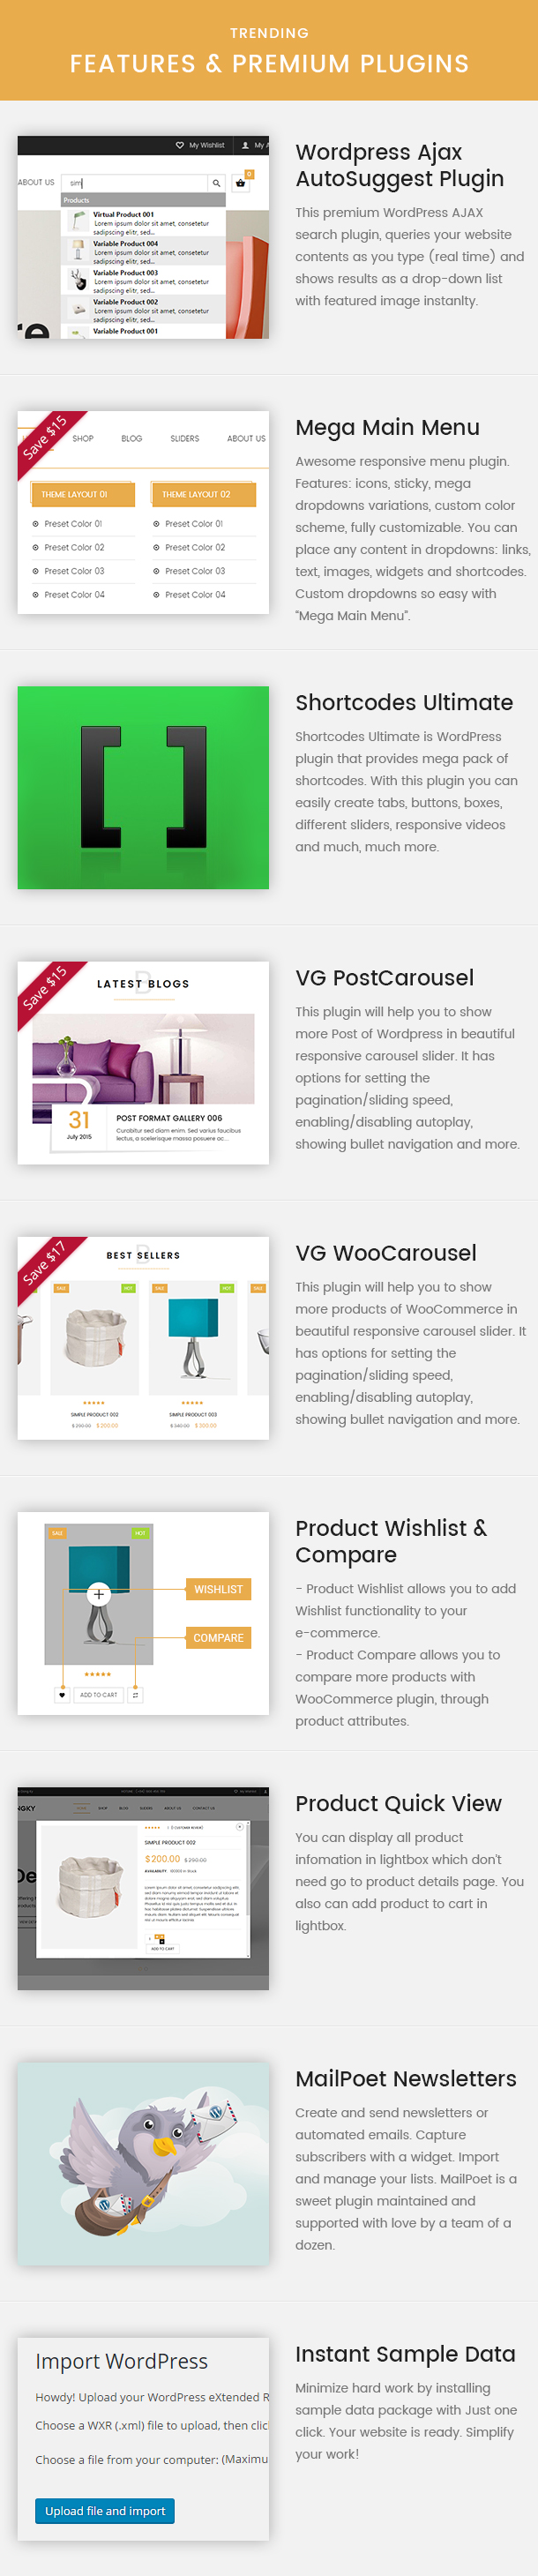 VG Dongky - Sauberes und minimales WooCommerce-WordPress-Template